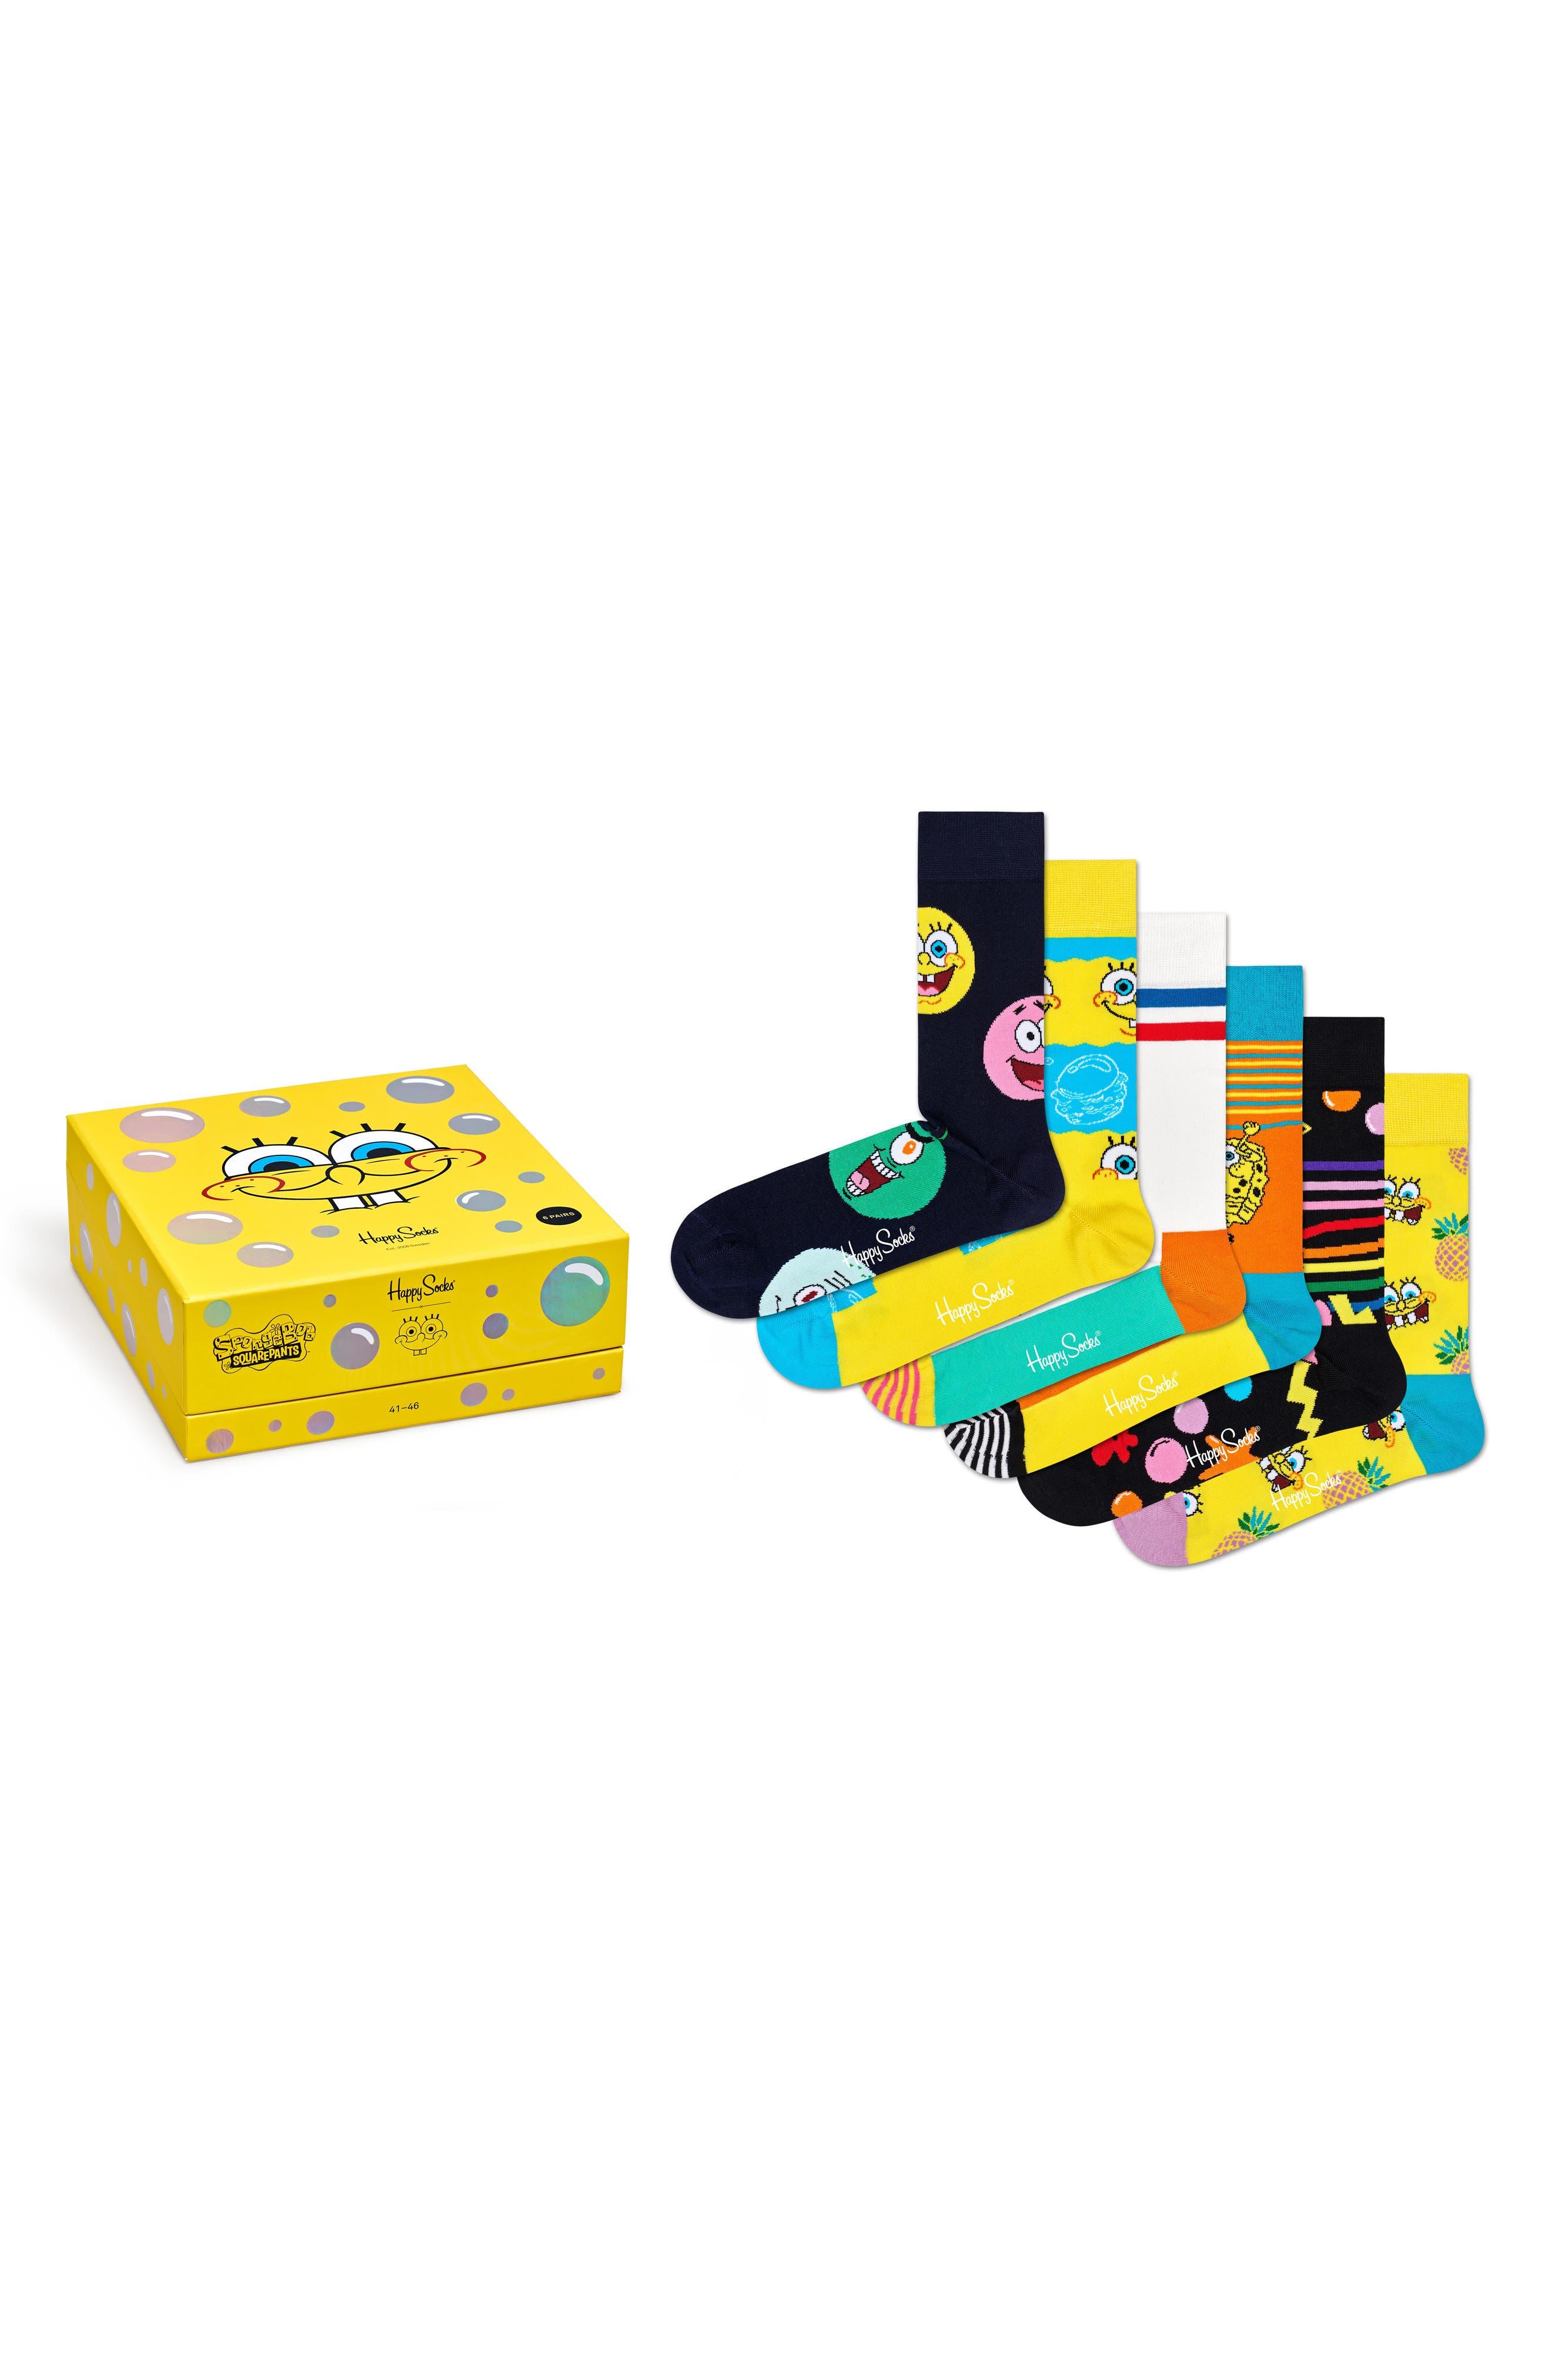 X Spongebob Assorted 6-Pack Crew Socks Gift Box